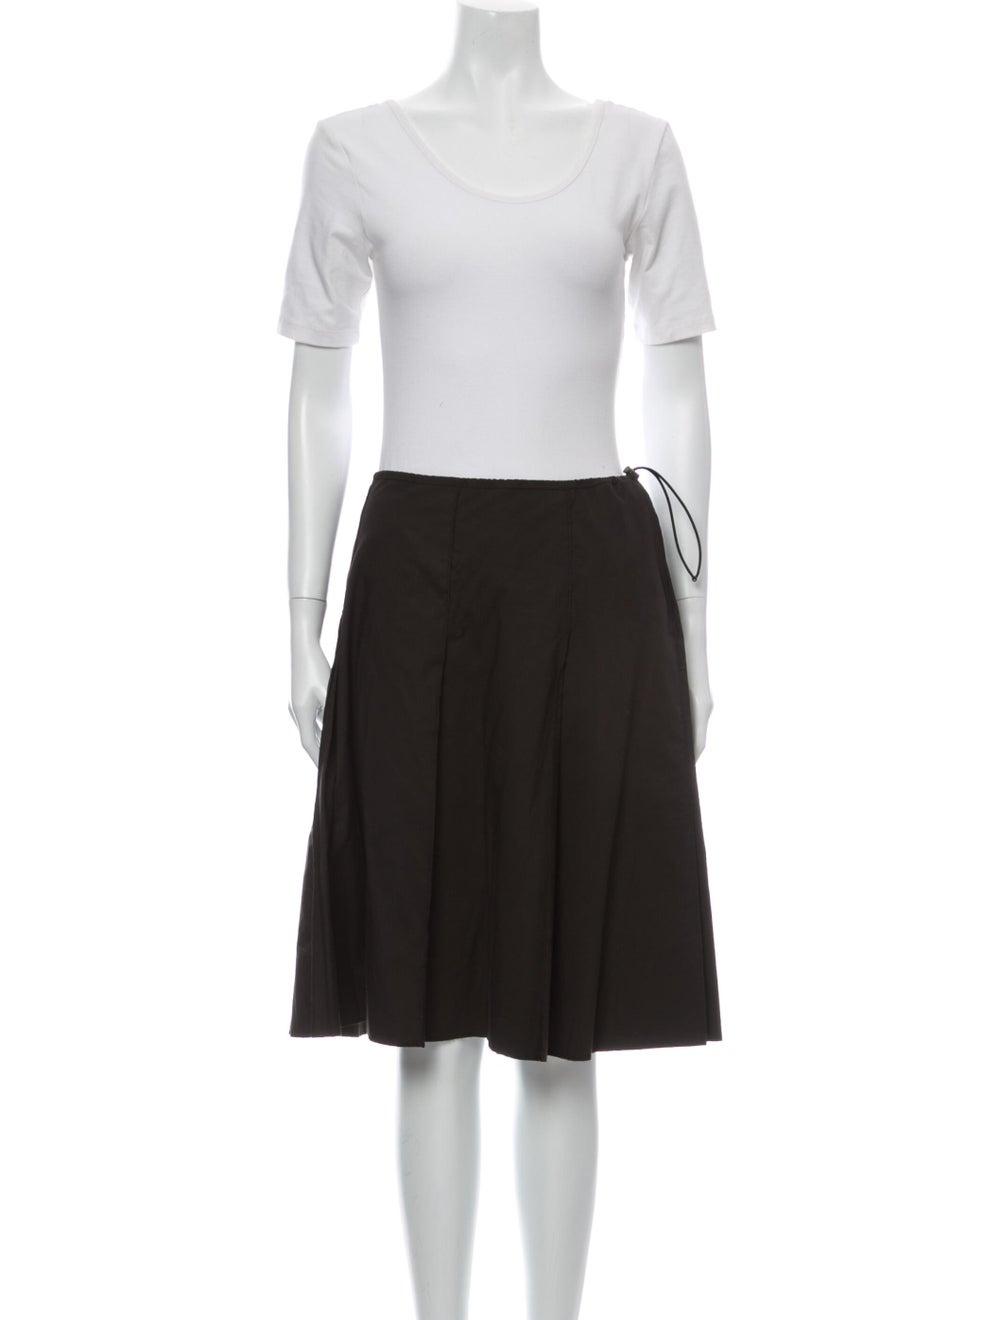 Prada Vintage 1990's Skirt Set Brown - image 4